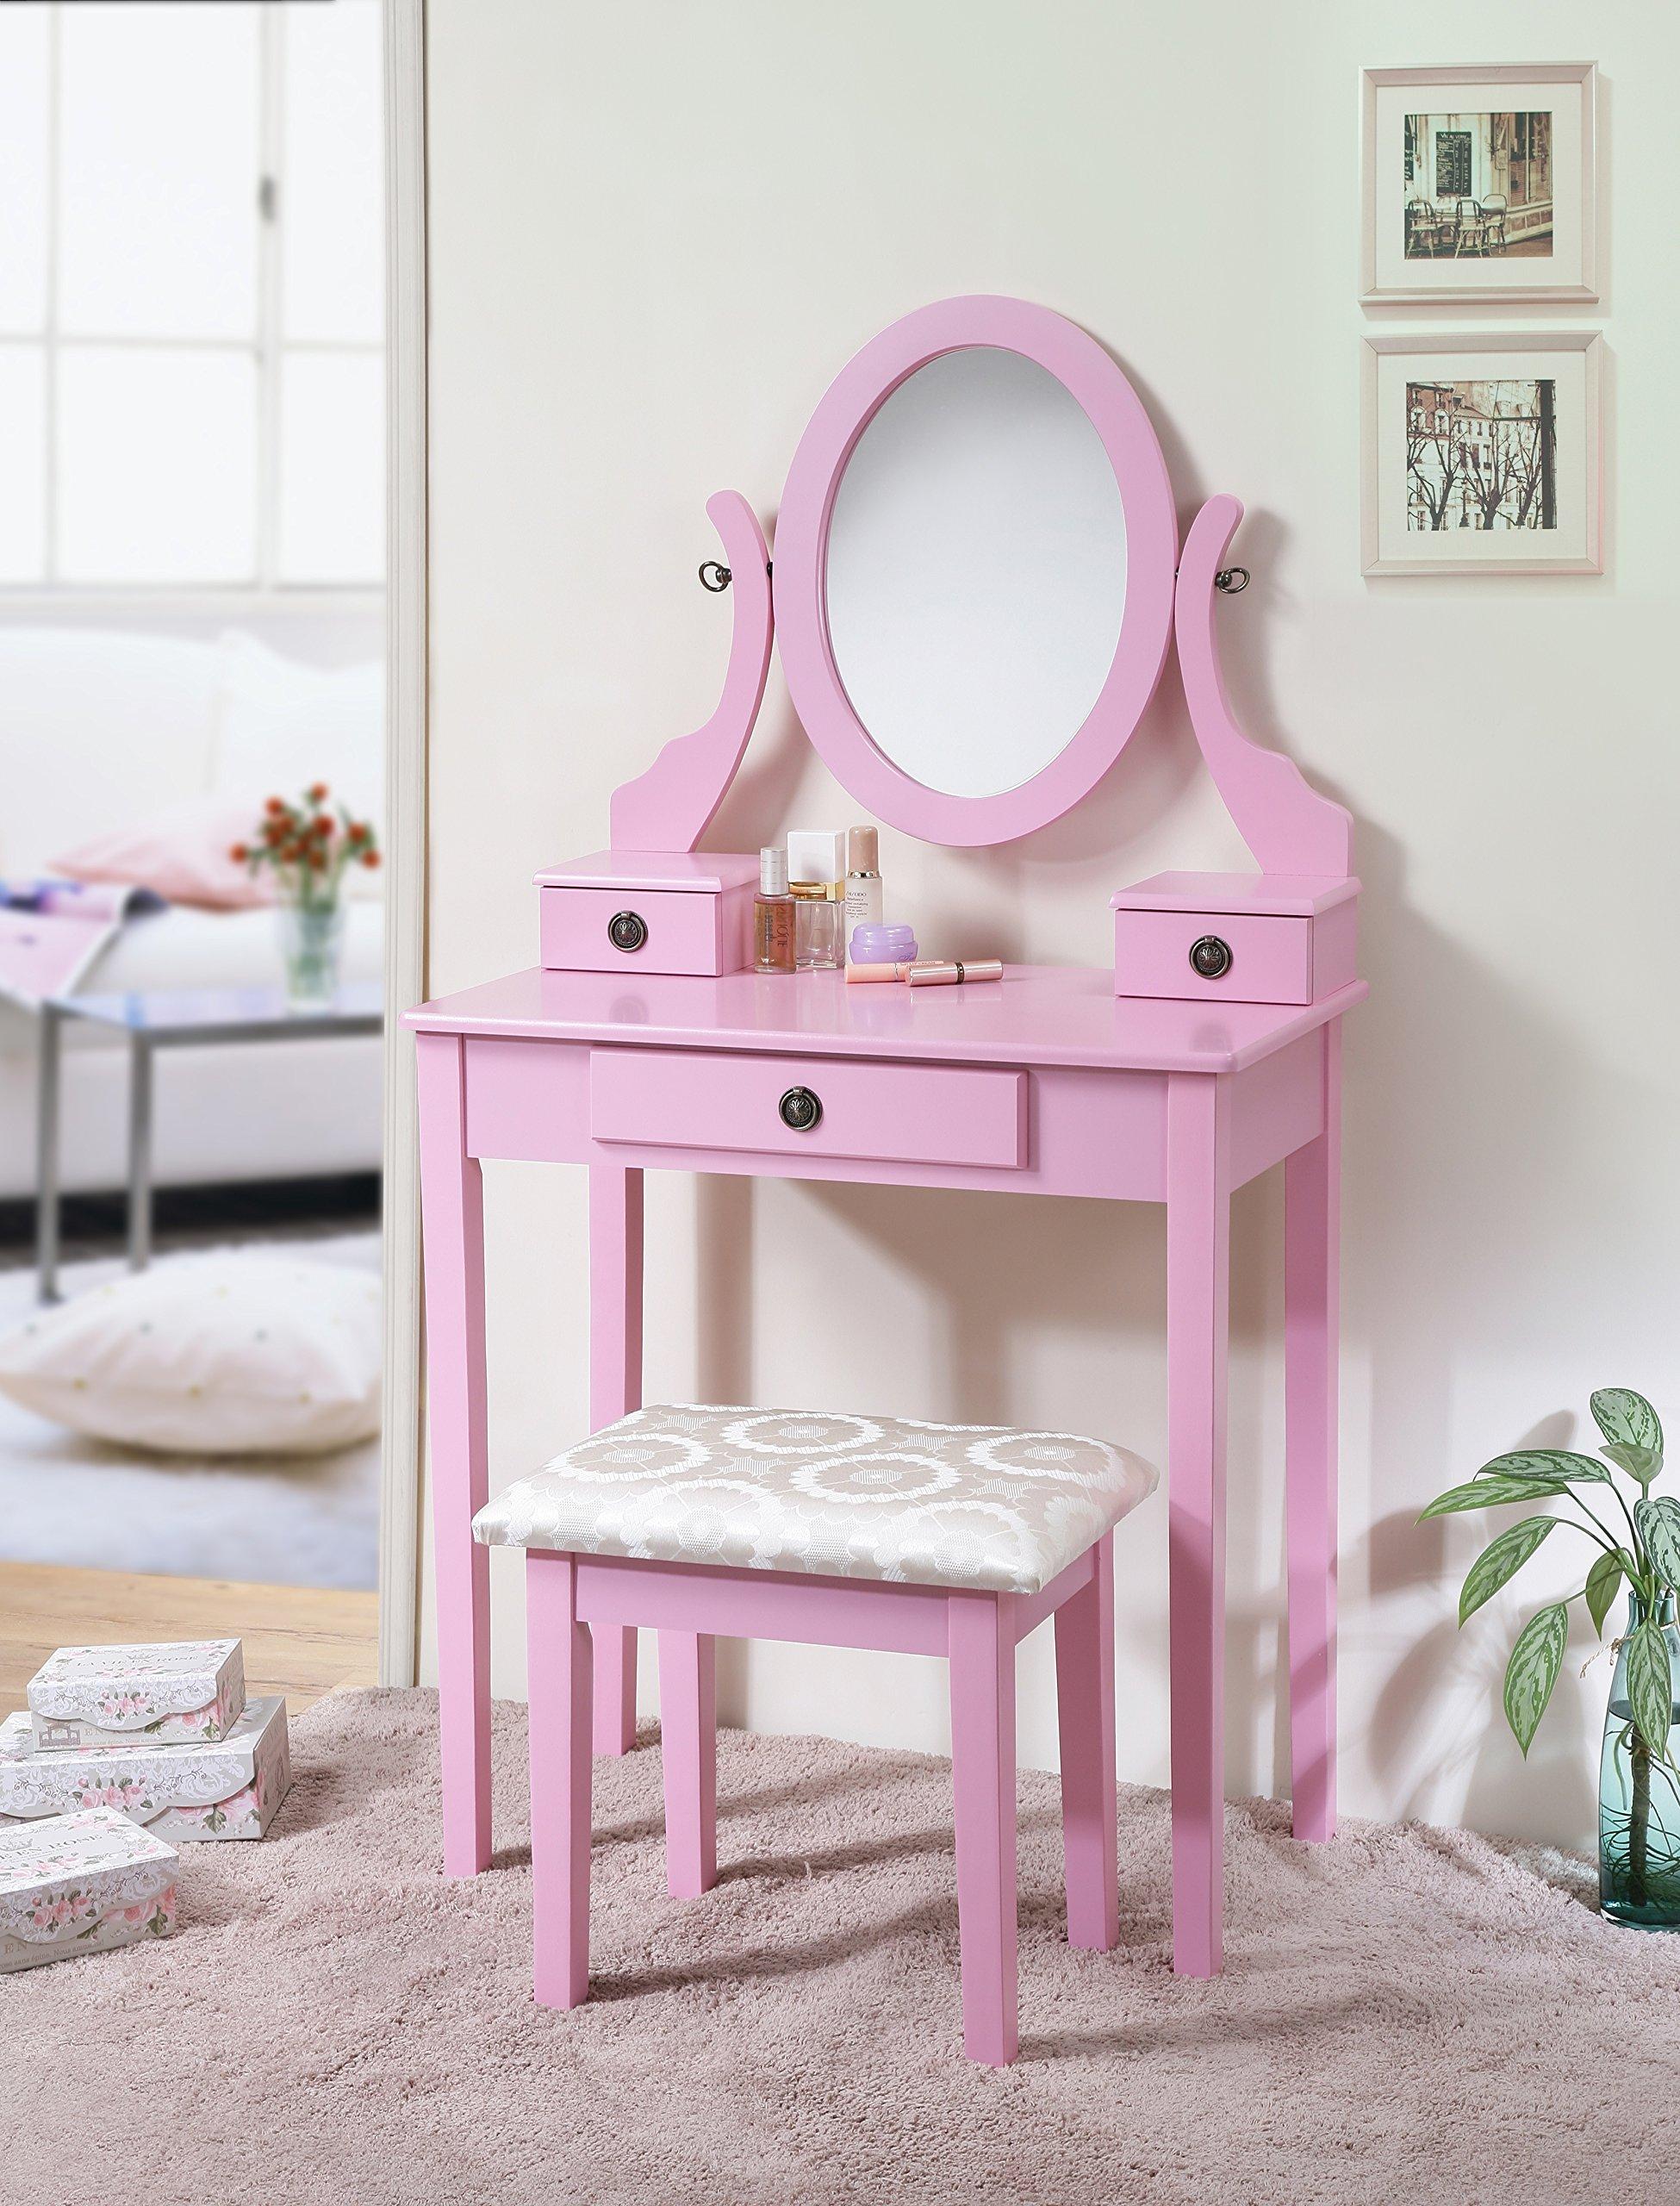 Roundhill Furniture 3415PI Moniys Wood Moniya Makeup Vanity Table and Stool Set, Pink